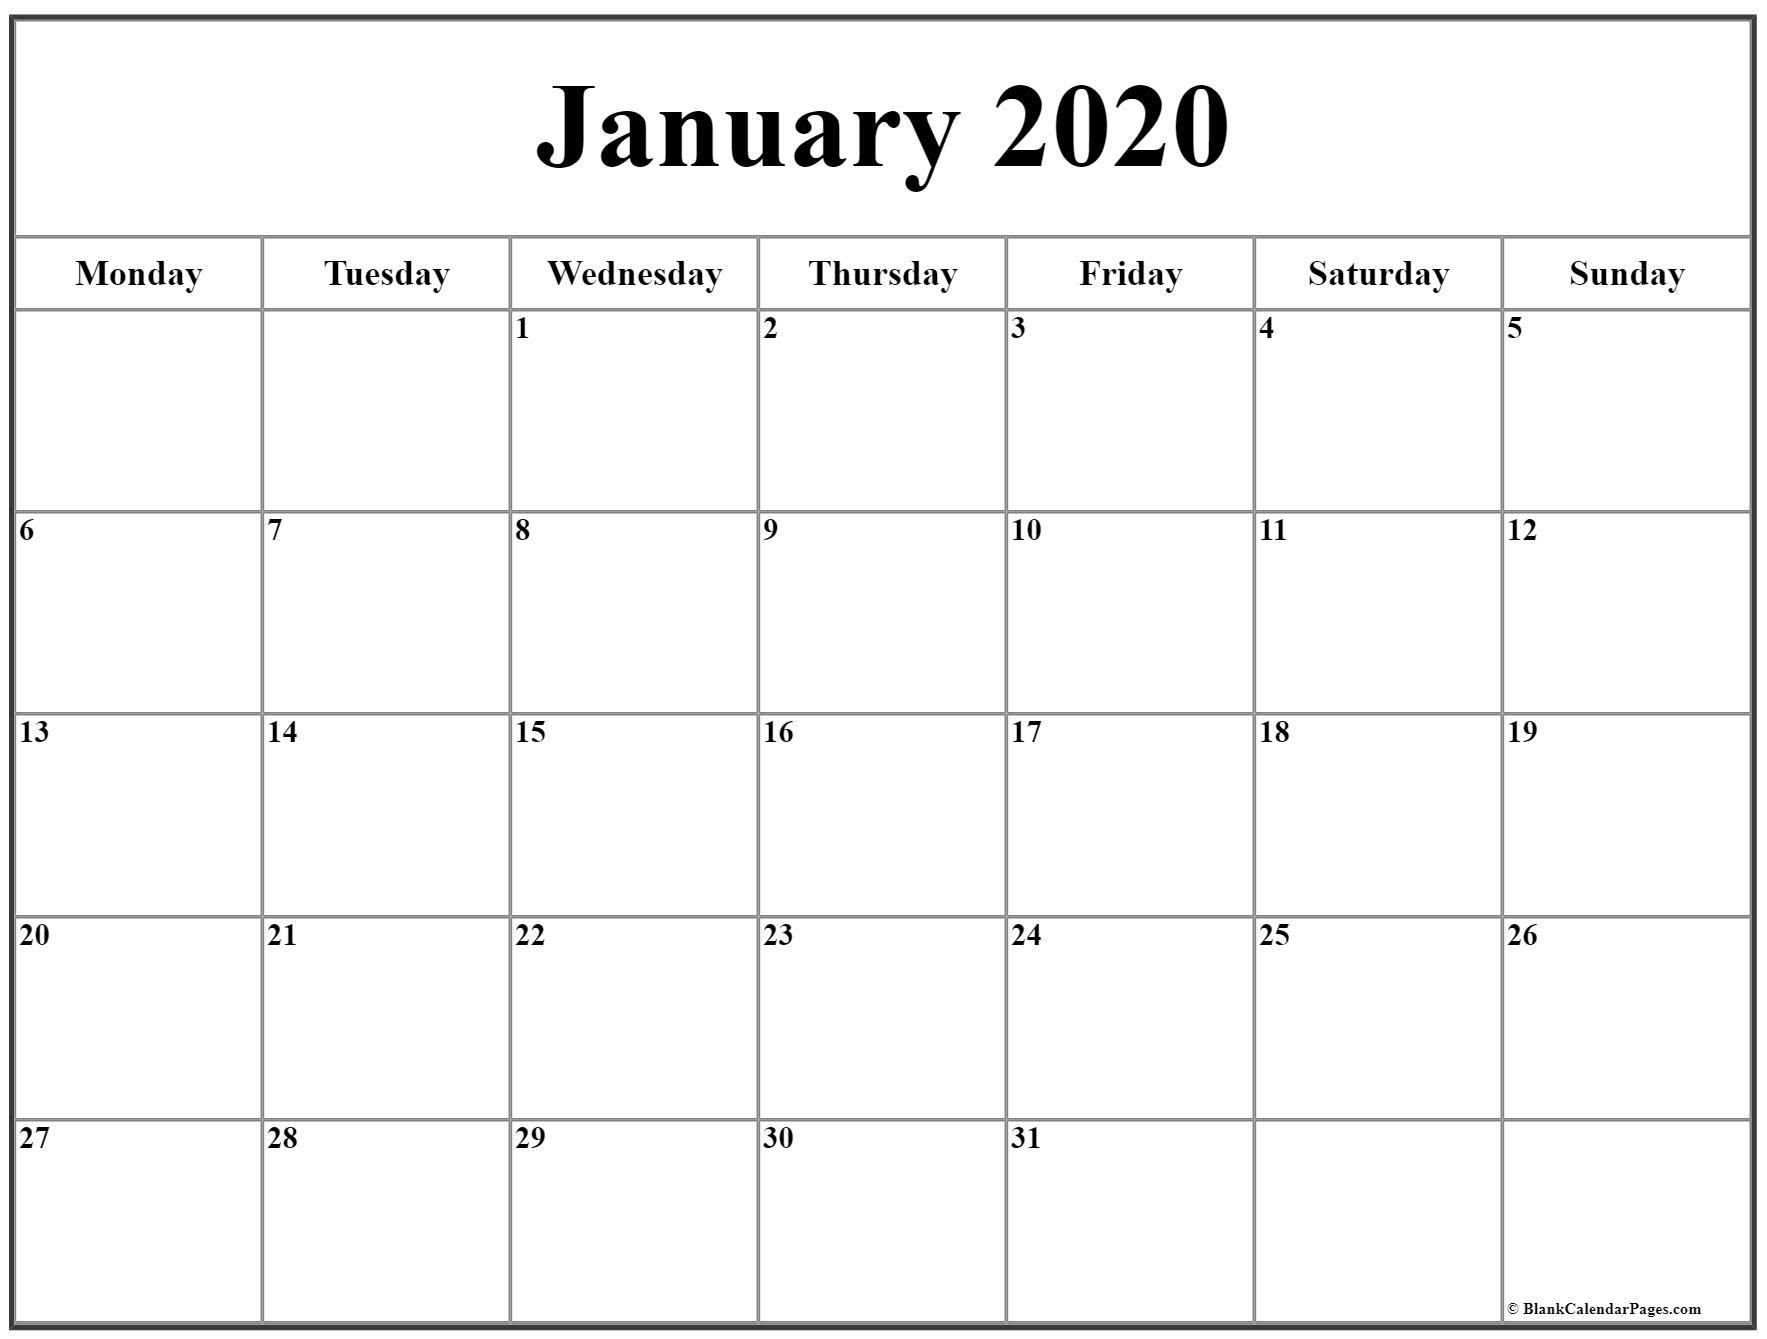 The Free Printable Monday Thru Sunday Calendars | Get Your Free Printable Calendars By Month Monday Through Sunday